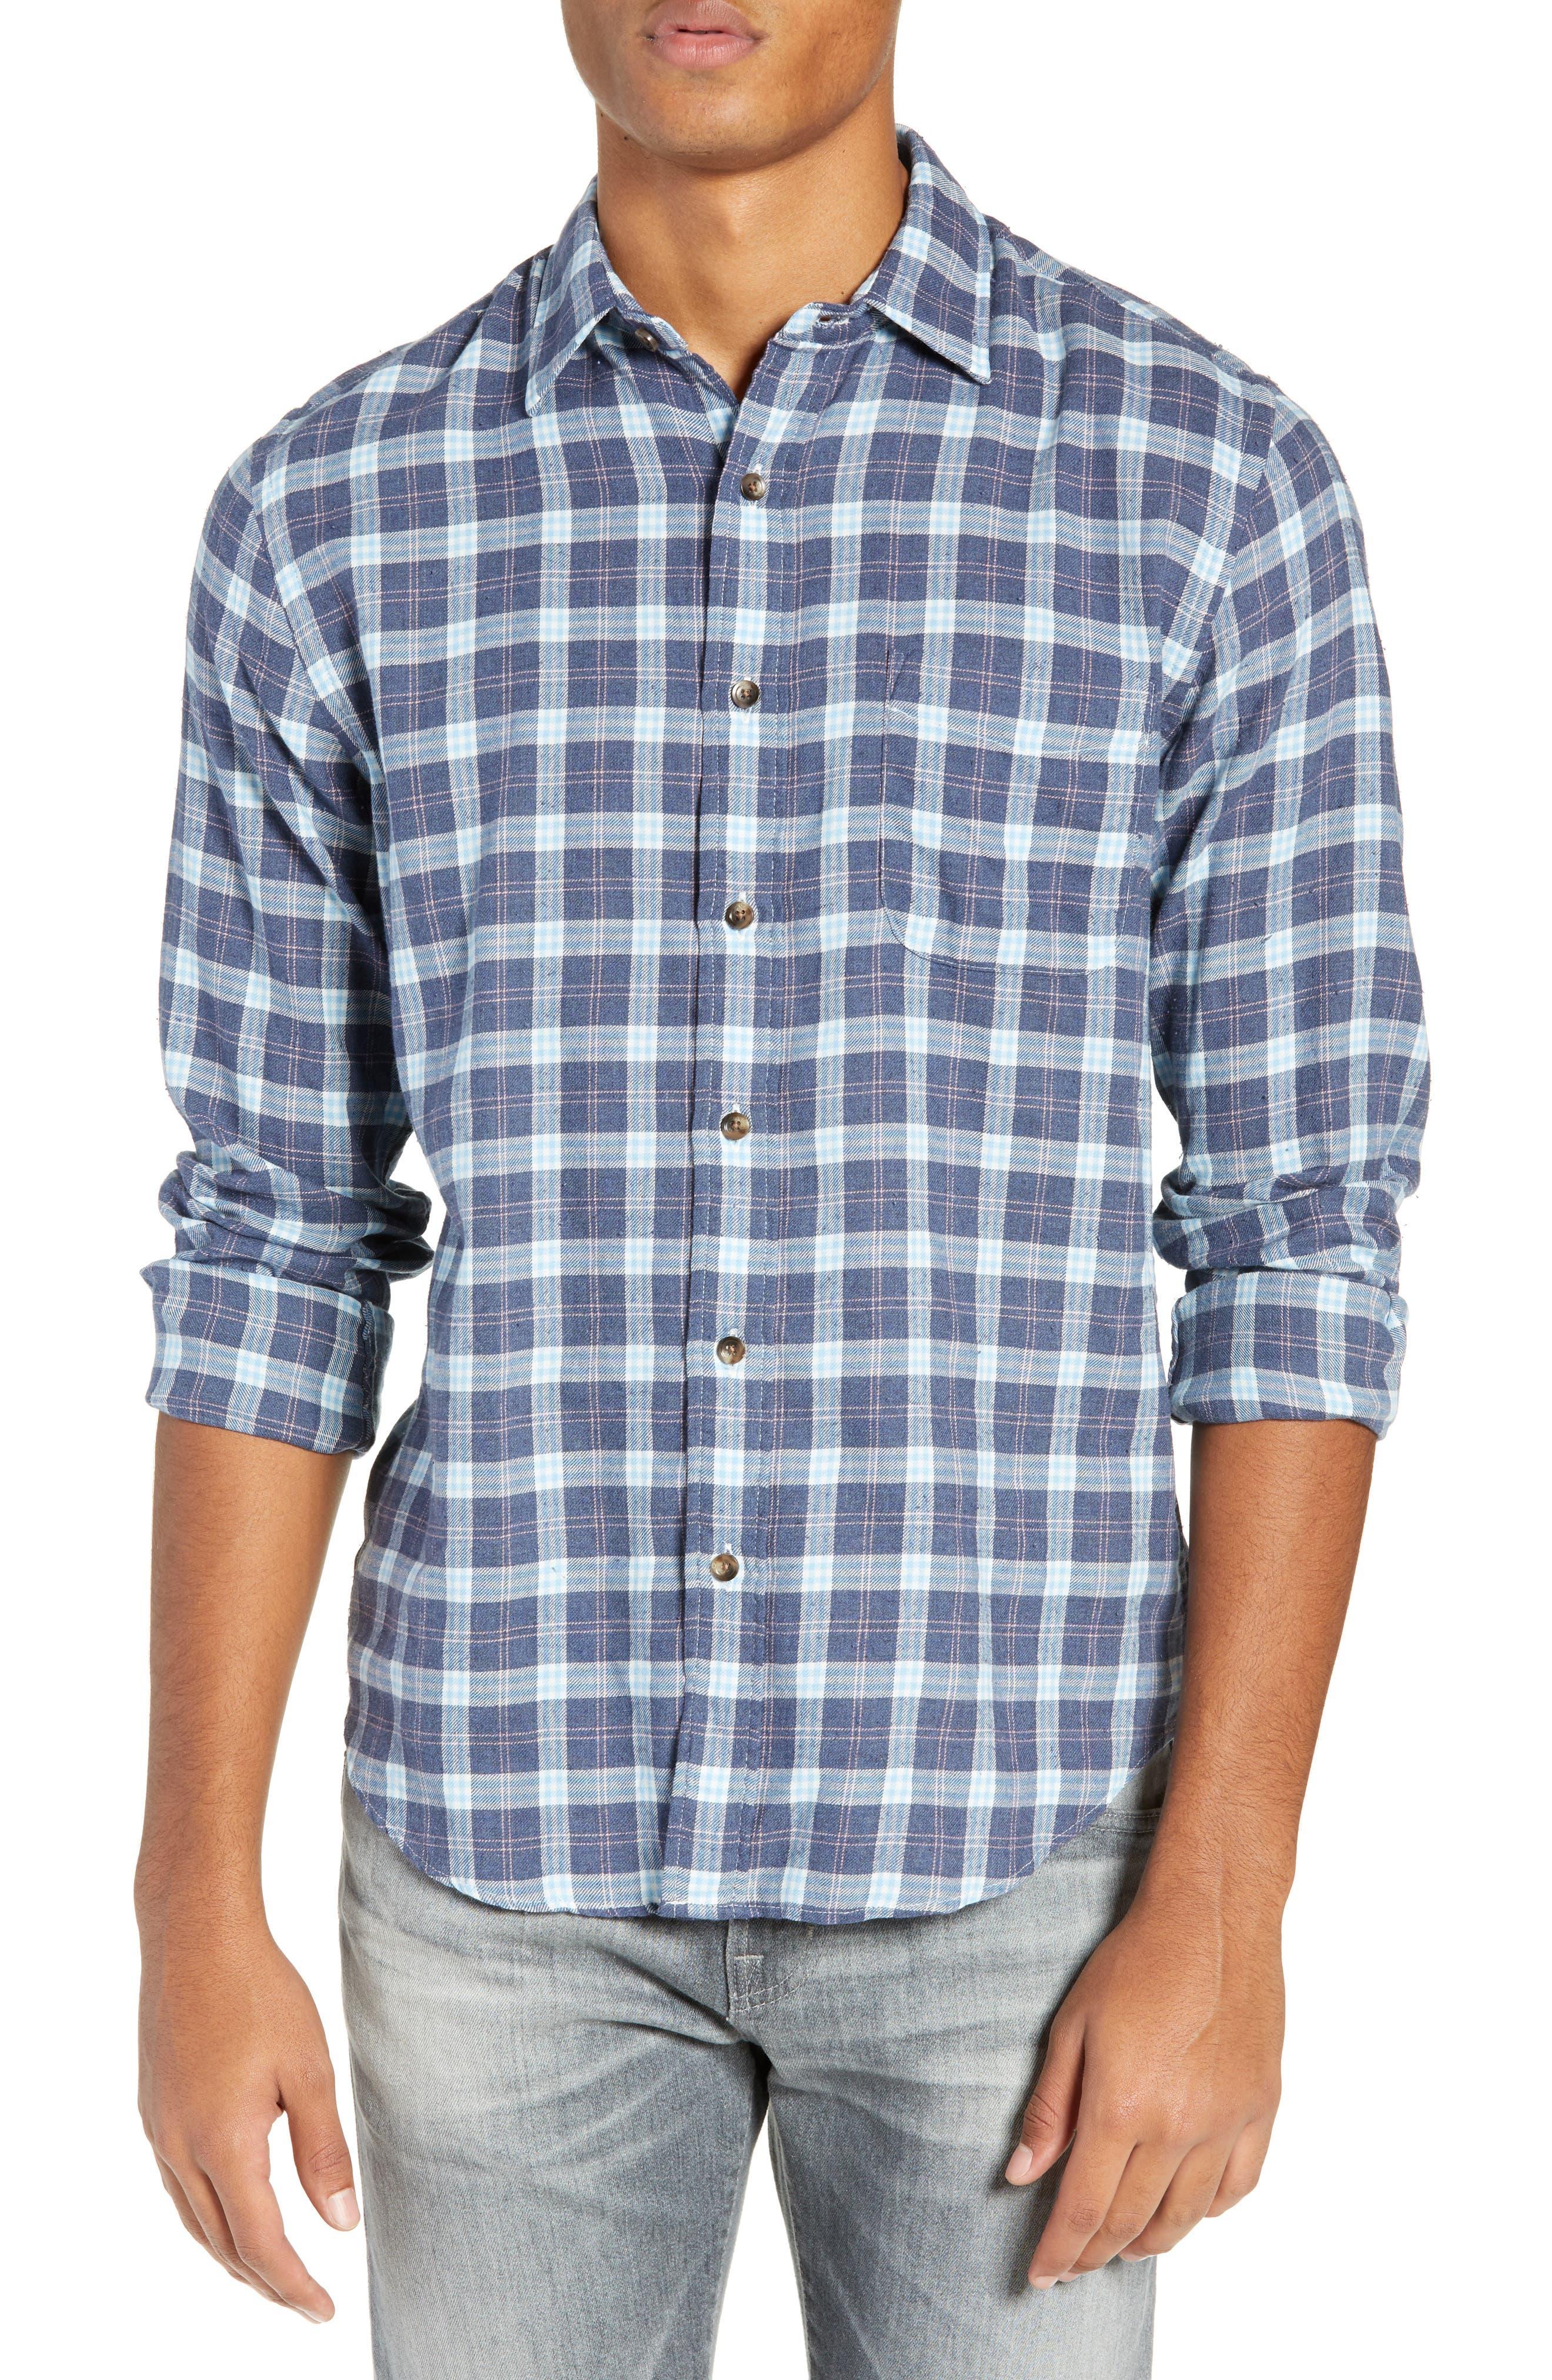 Brushed Alpine Regular Fit Flannel Shirt,                             Main thumbnail 1, color,                             INDIGO BLUE CORAL